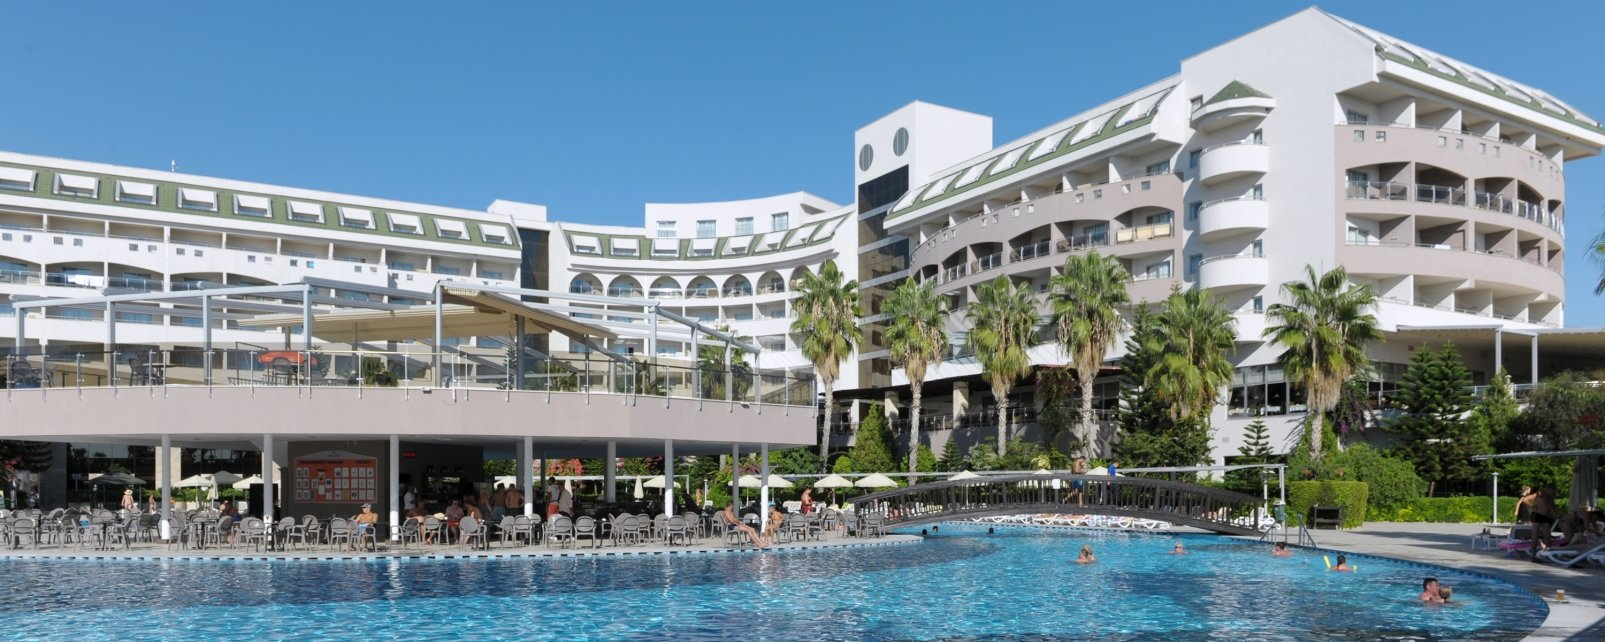 Hotel Amelia Beach Resort Hotel Spa